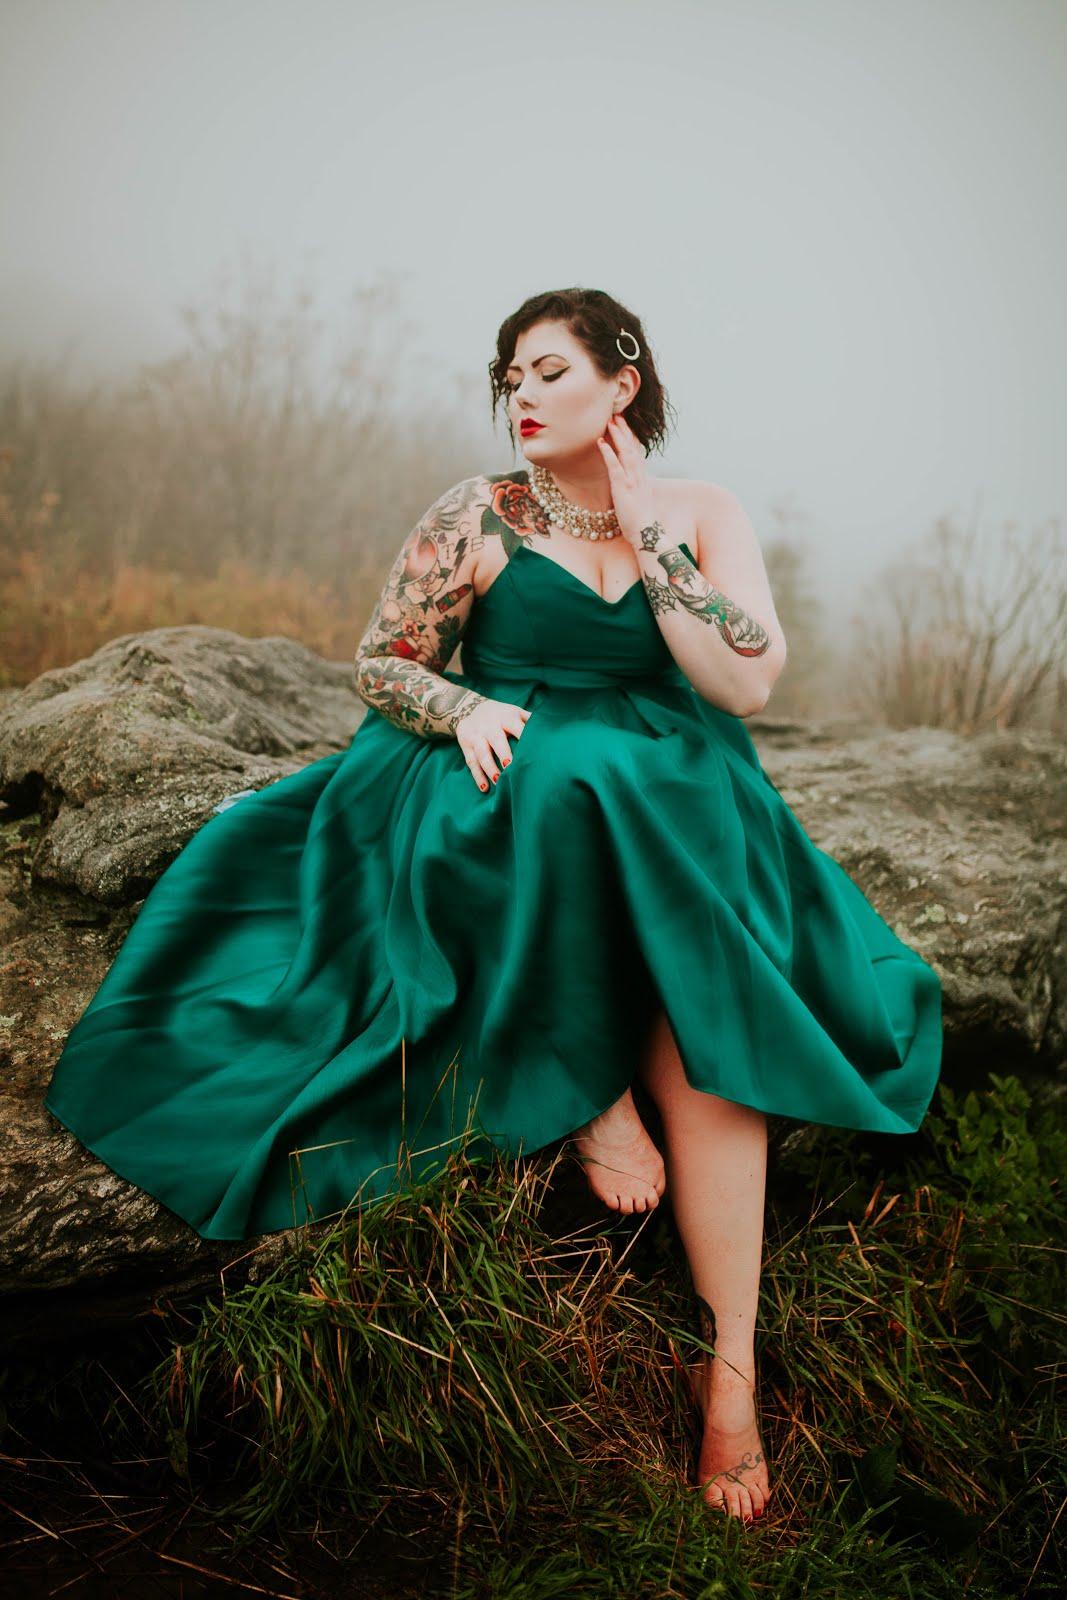 Trashy Betty Photography - Anderson, SC PinUp Boudoir & Portrait Photographer